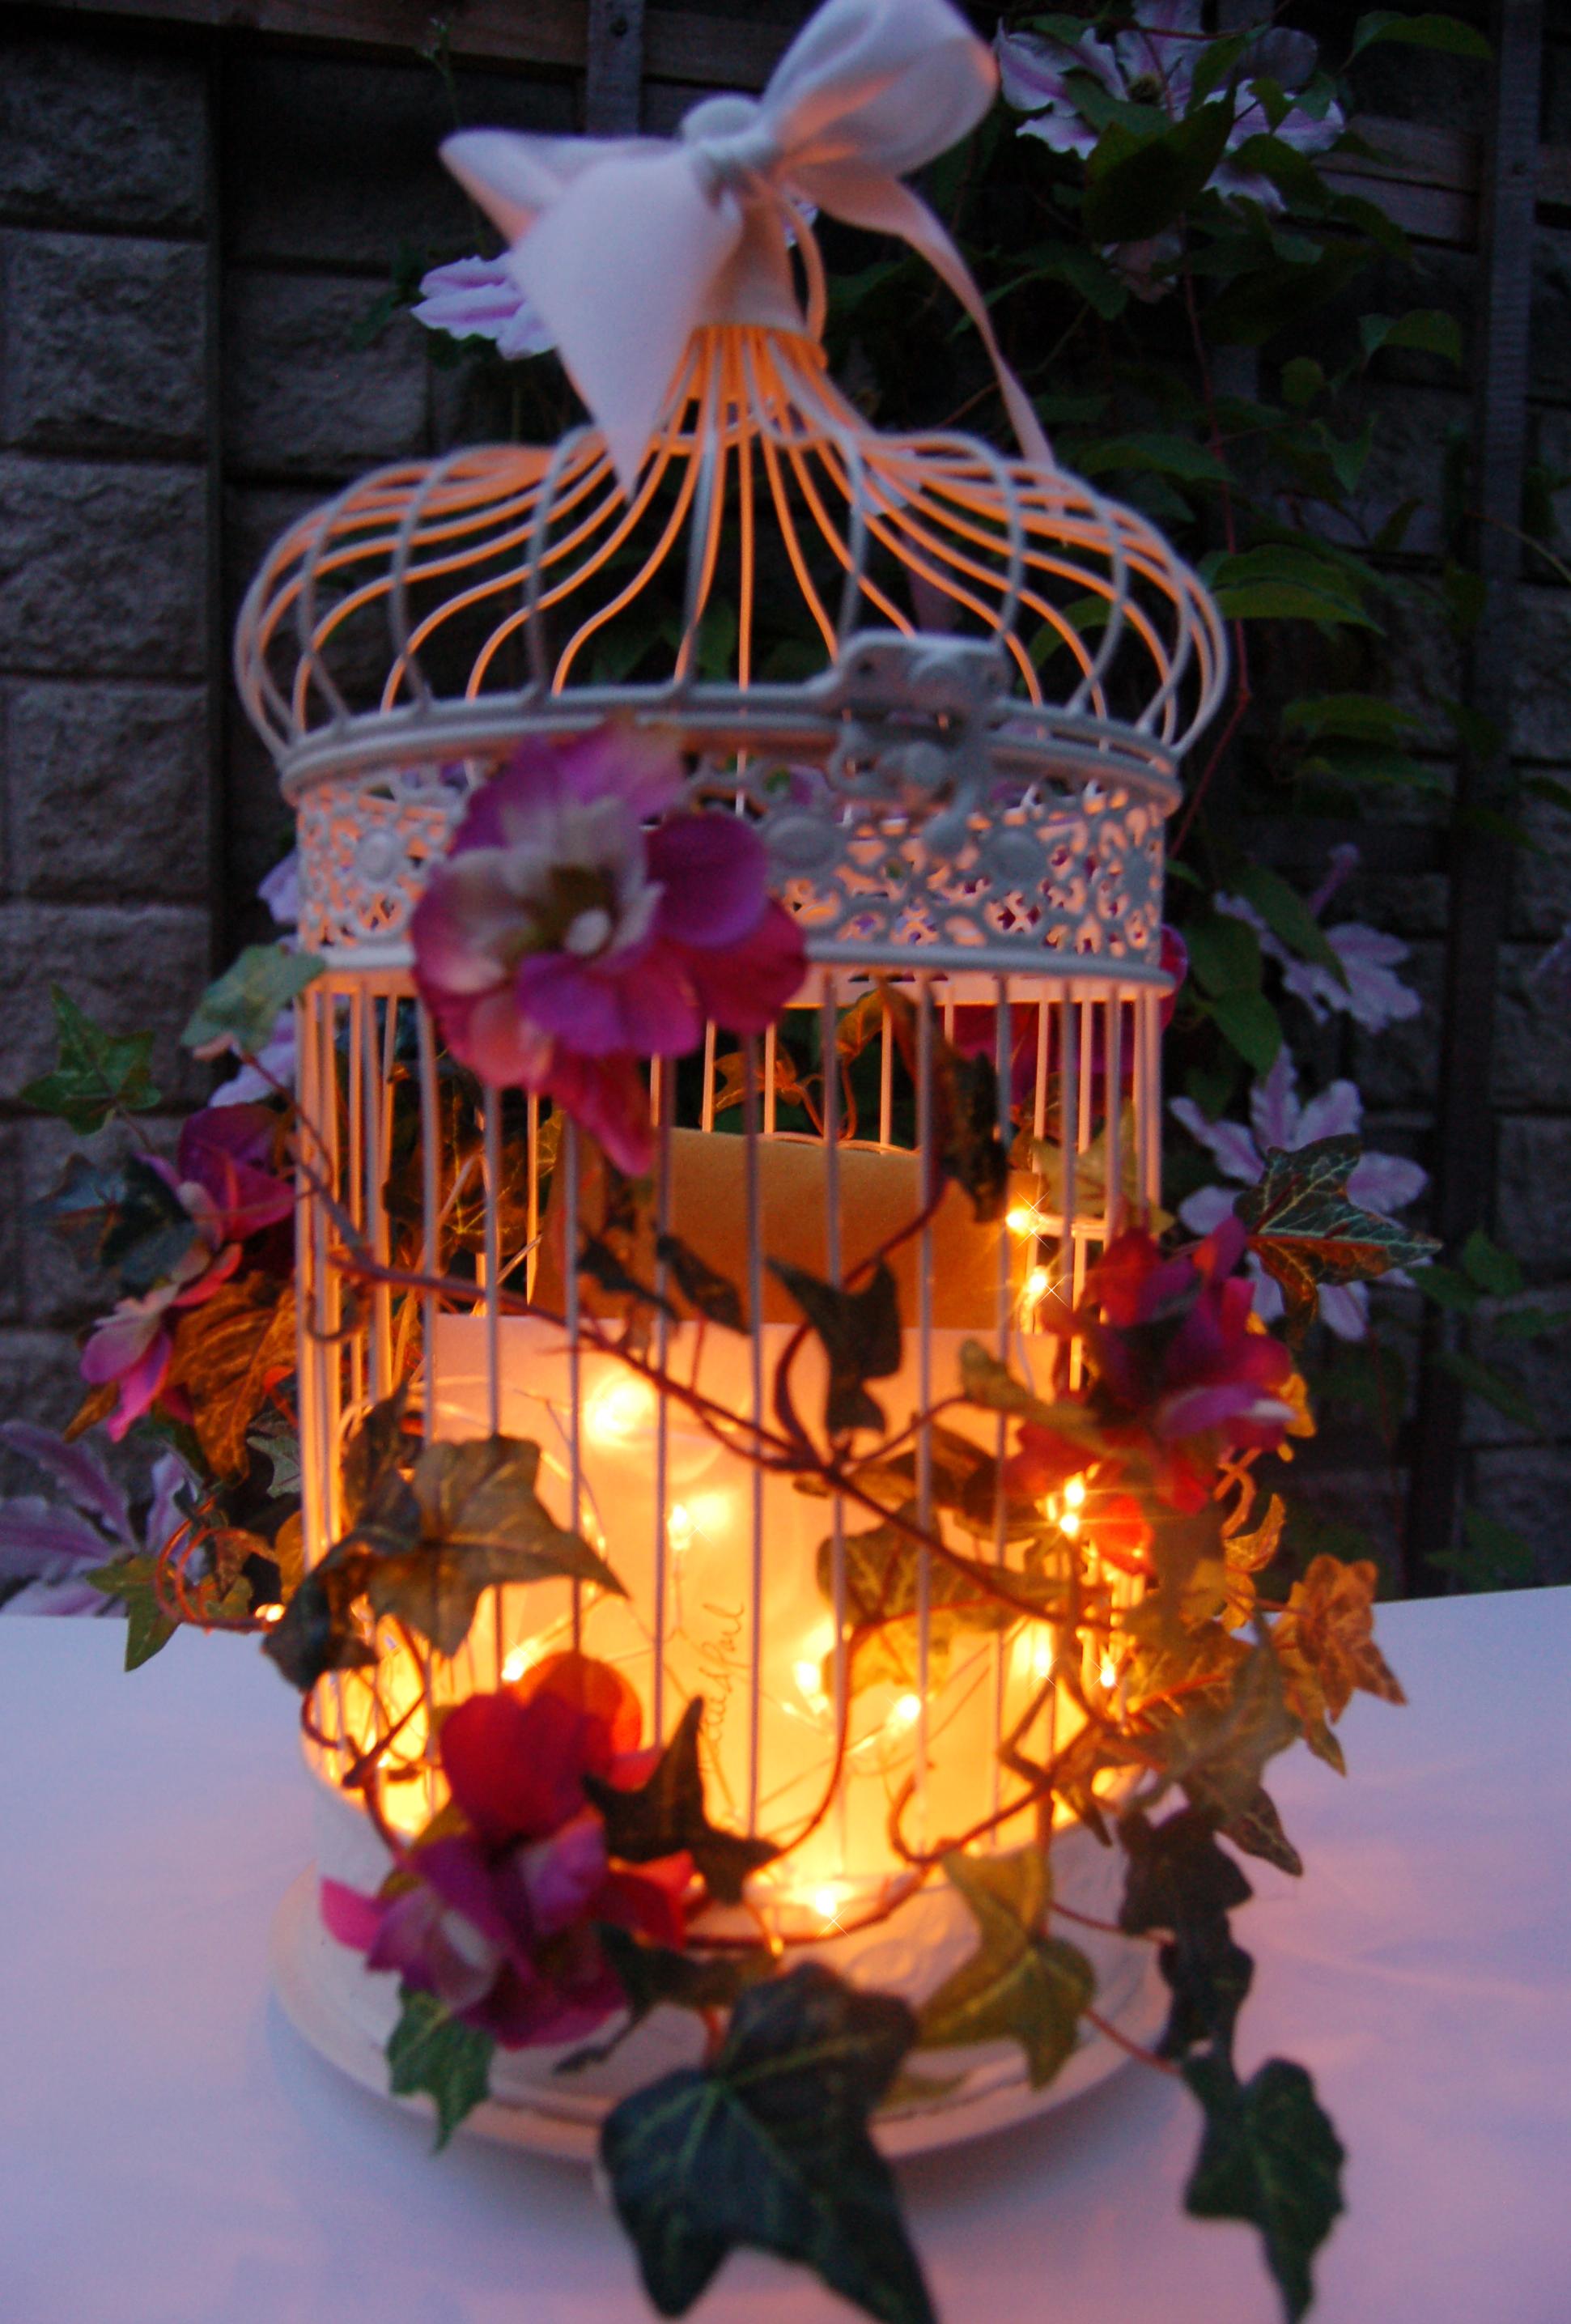 Les belles cages on pinterest bird cages birdcage centerpieces and birdcage decor - Birdhouse nightlight ...